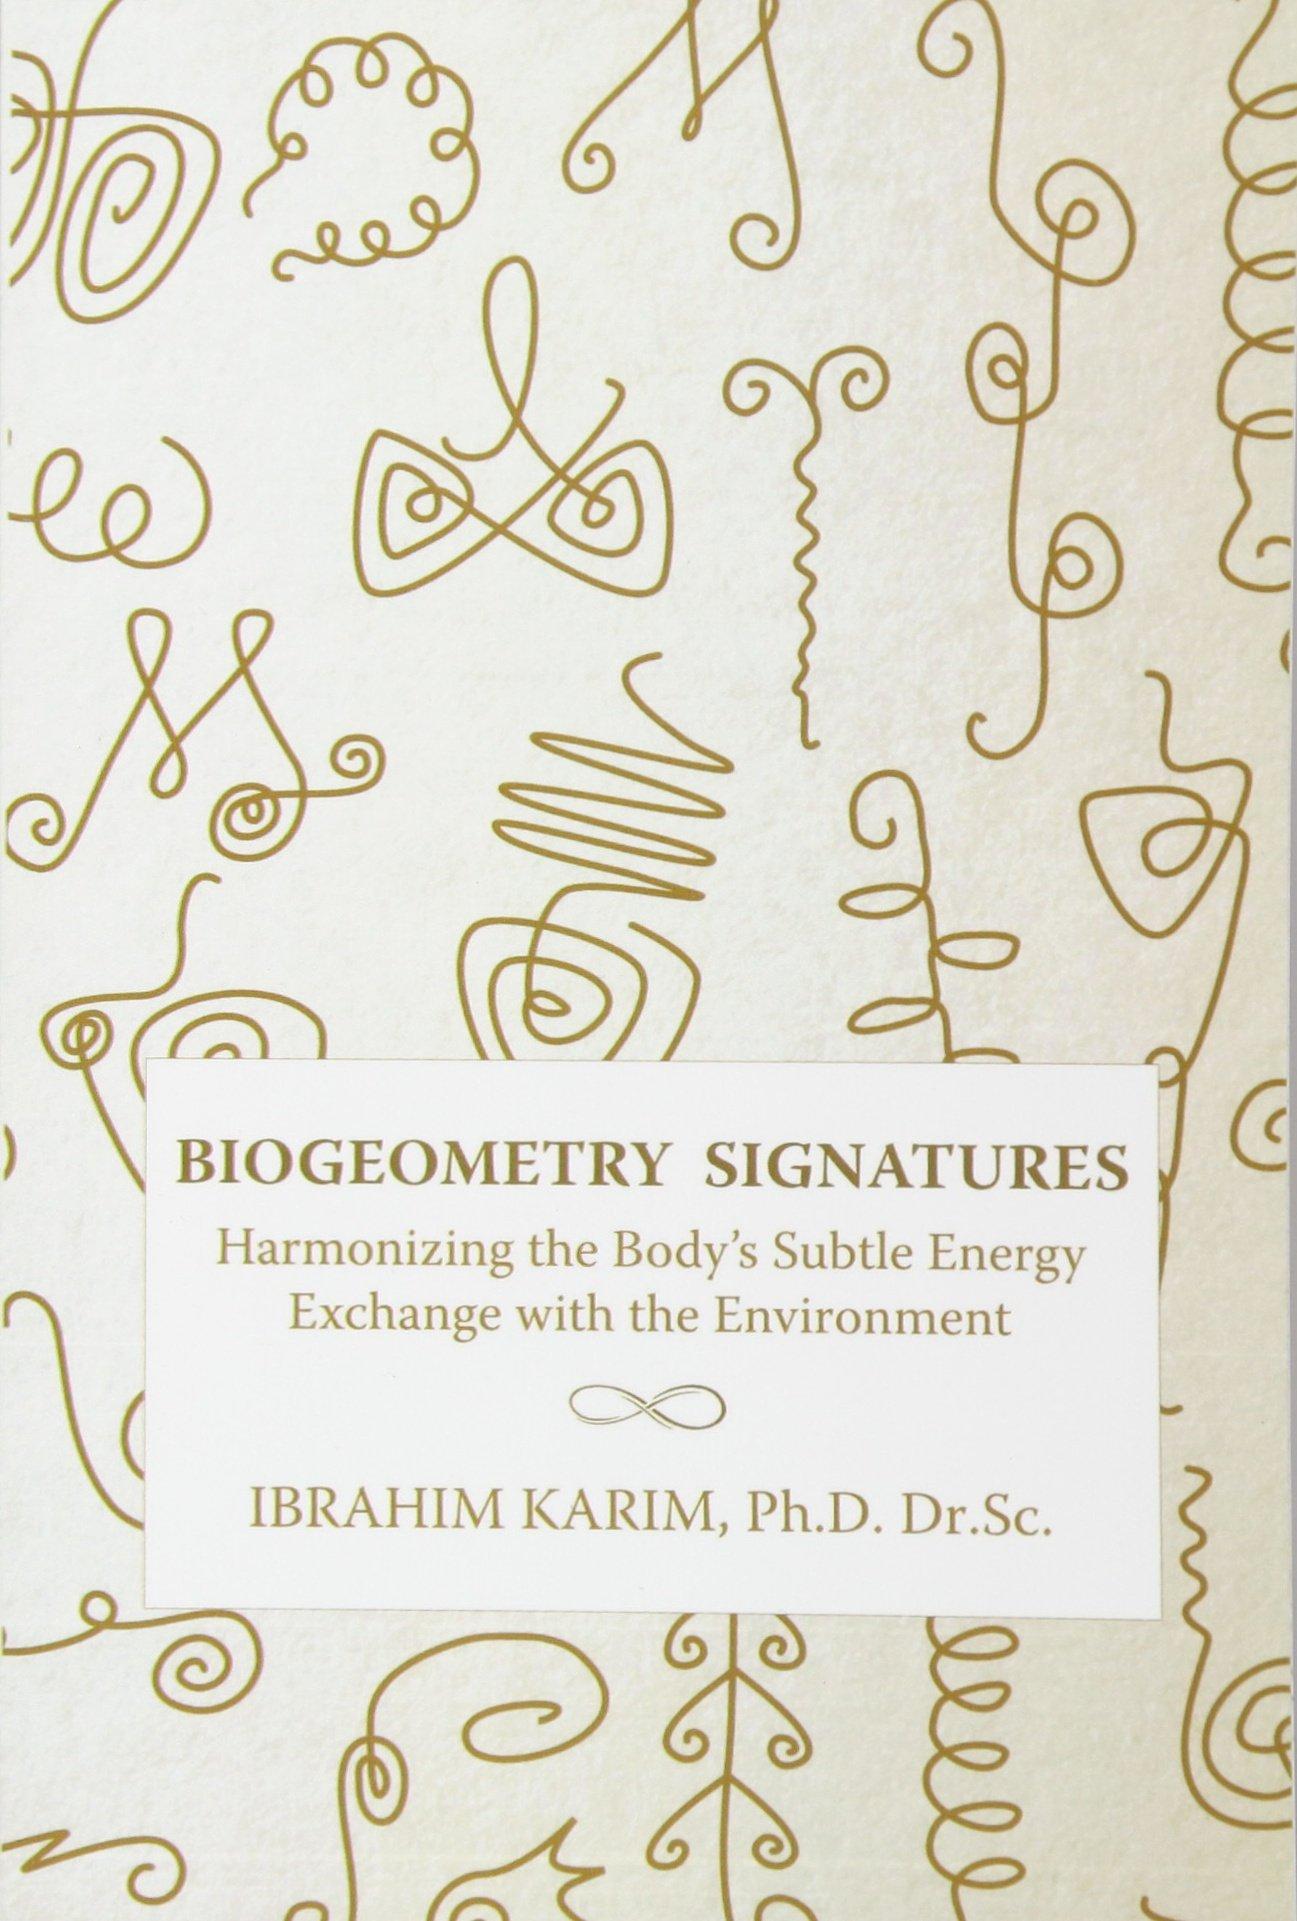 Biogeometry Signatures : Harmonizing the Body's Subtle Energy Exchange with the Environment